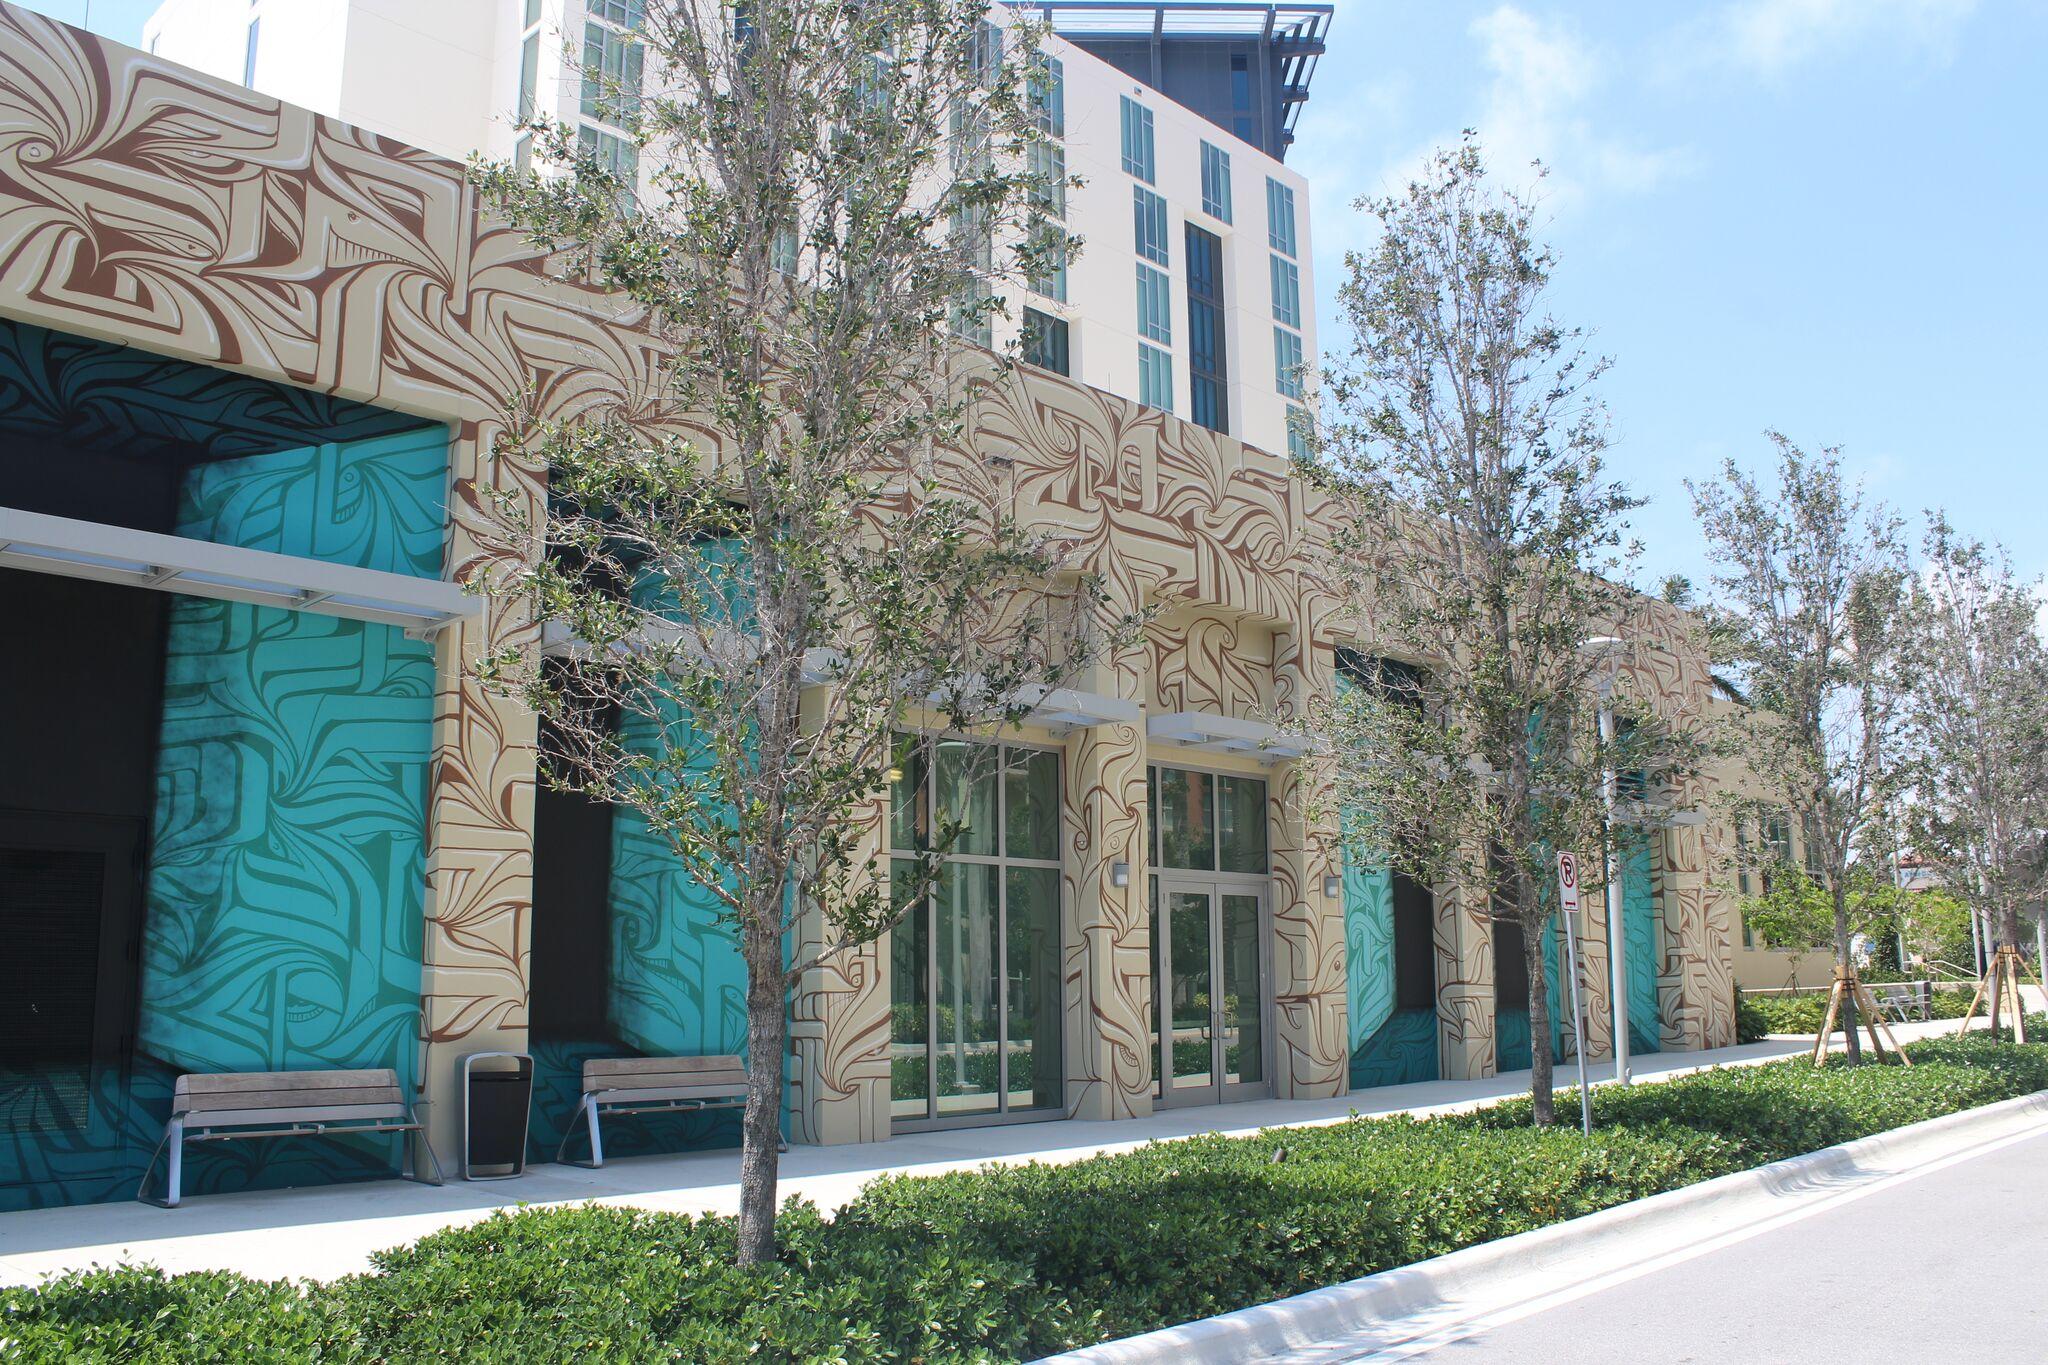 untitled - ASTROLocation: Hilton West Palm Beach